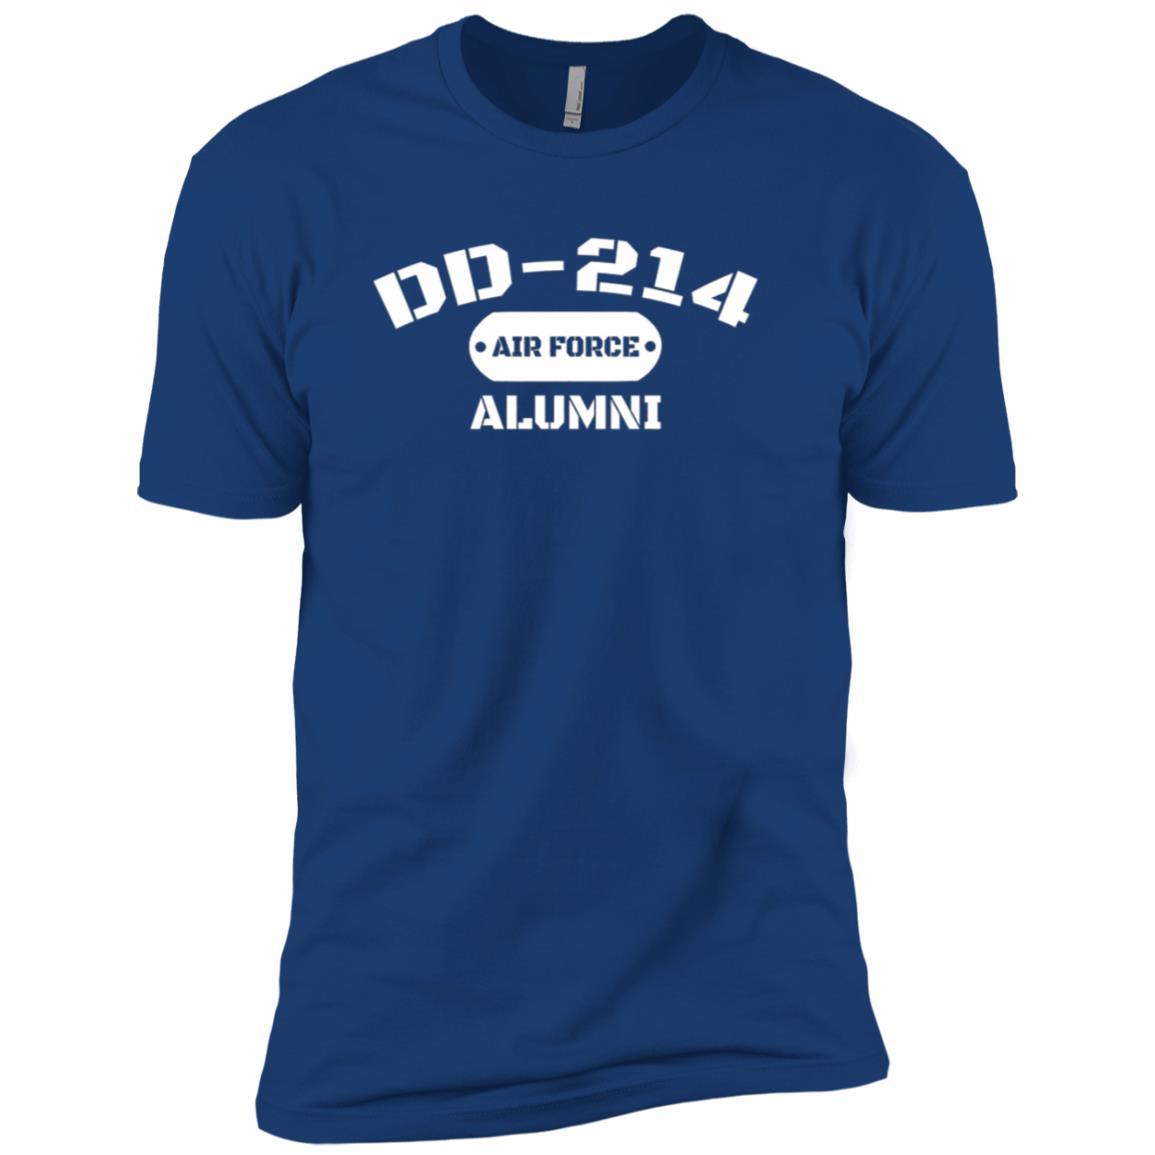 DD-214 US Air Force Alumni Men and Women Men Short Sleeve T-Shirt